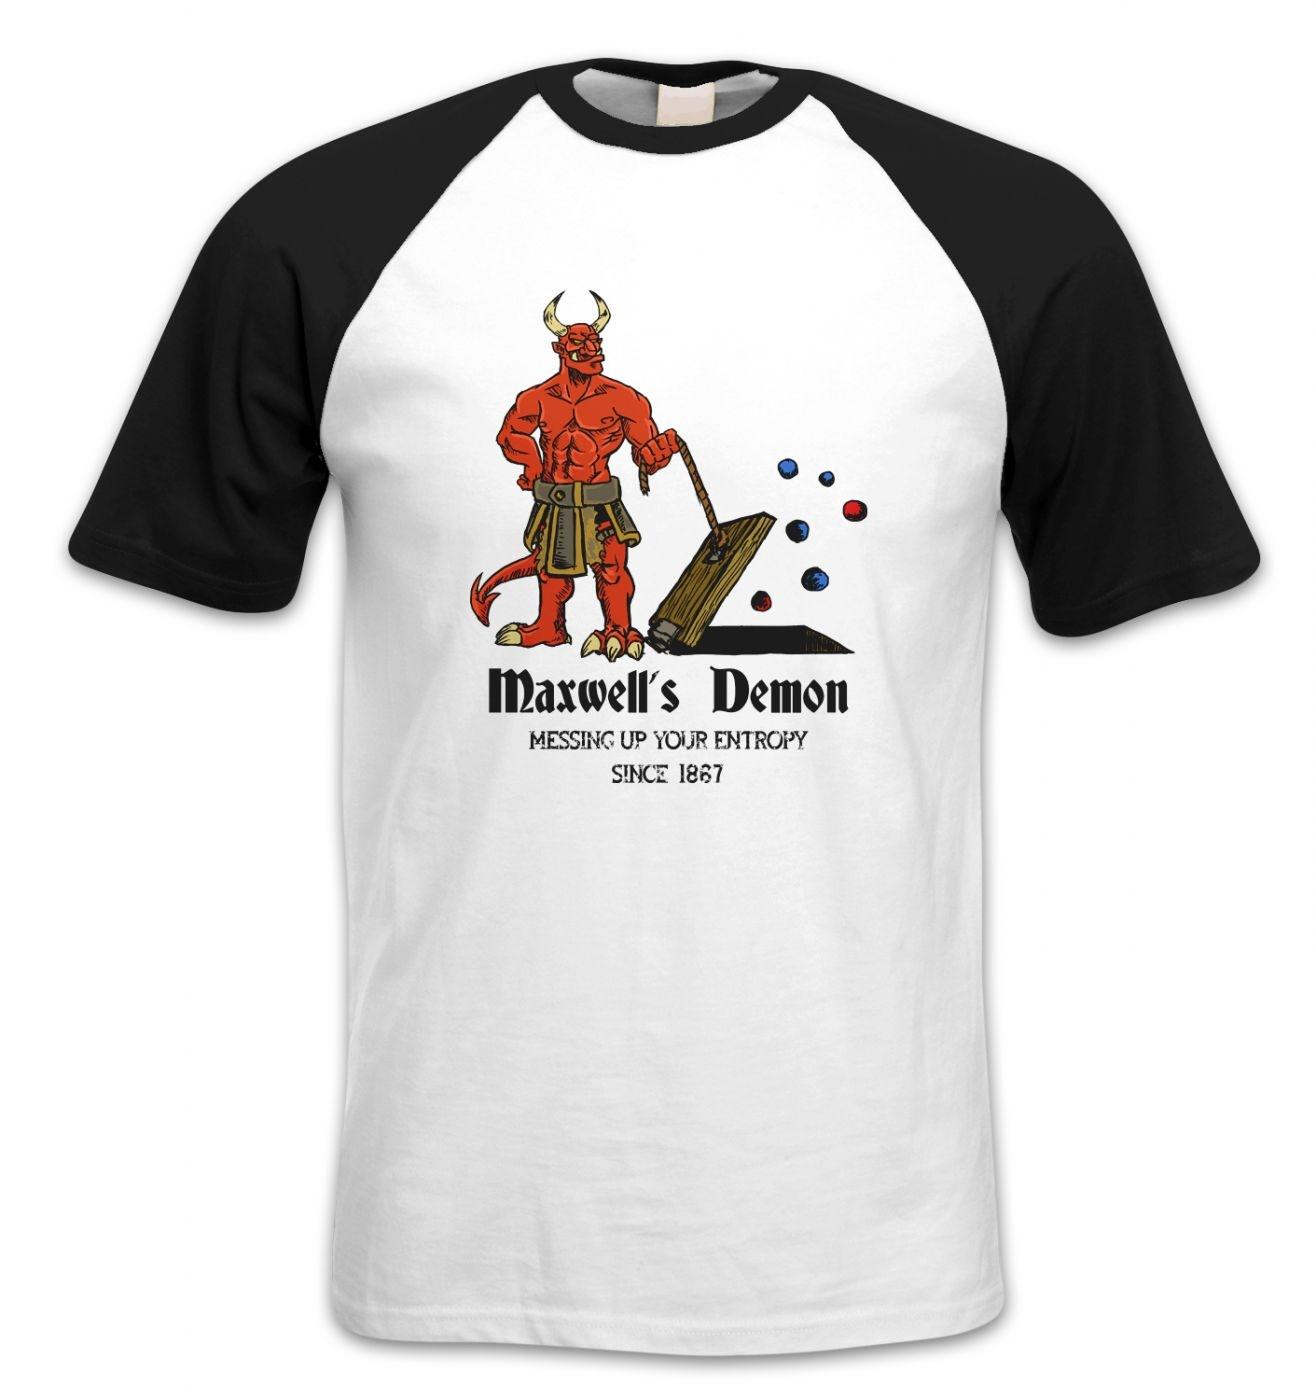 Maxwell's Demon t-shirt - Somethinggeeky